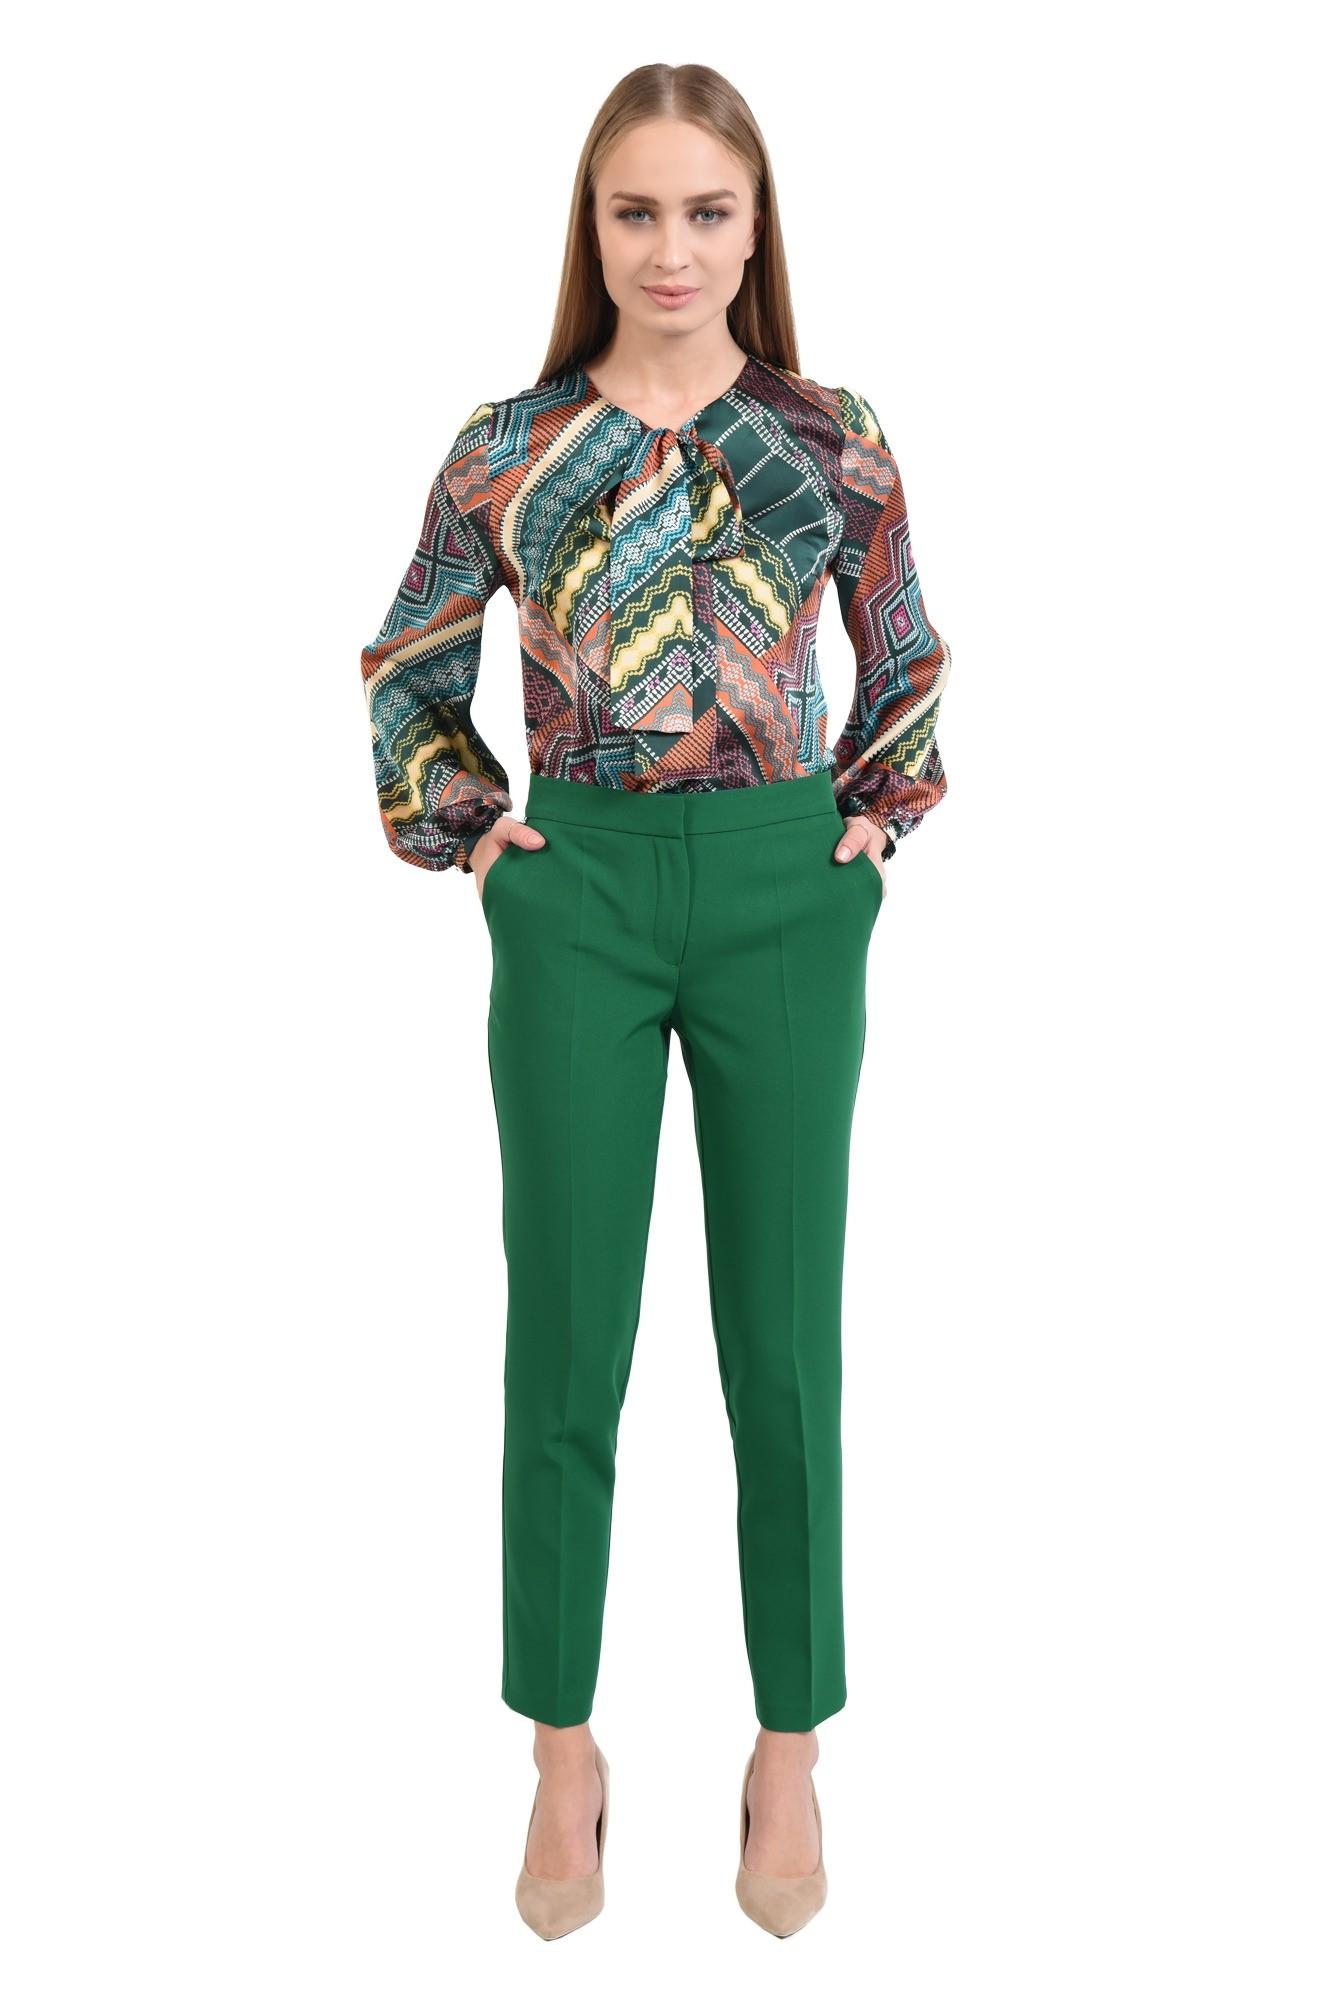 360 - pantaloni casual, croi conic, betelie, la dunga